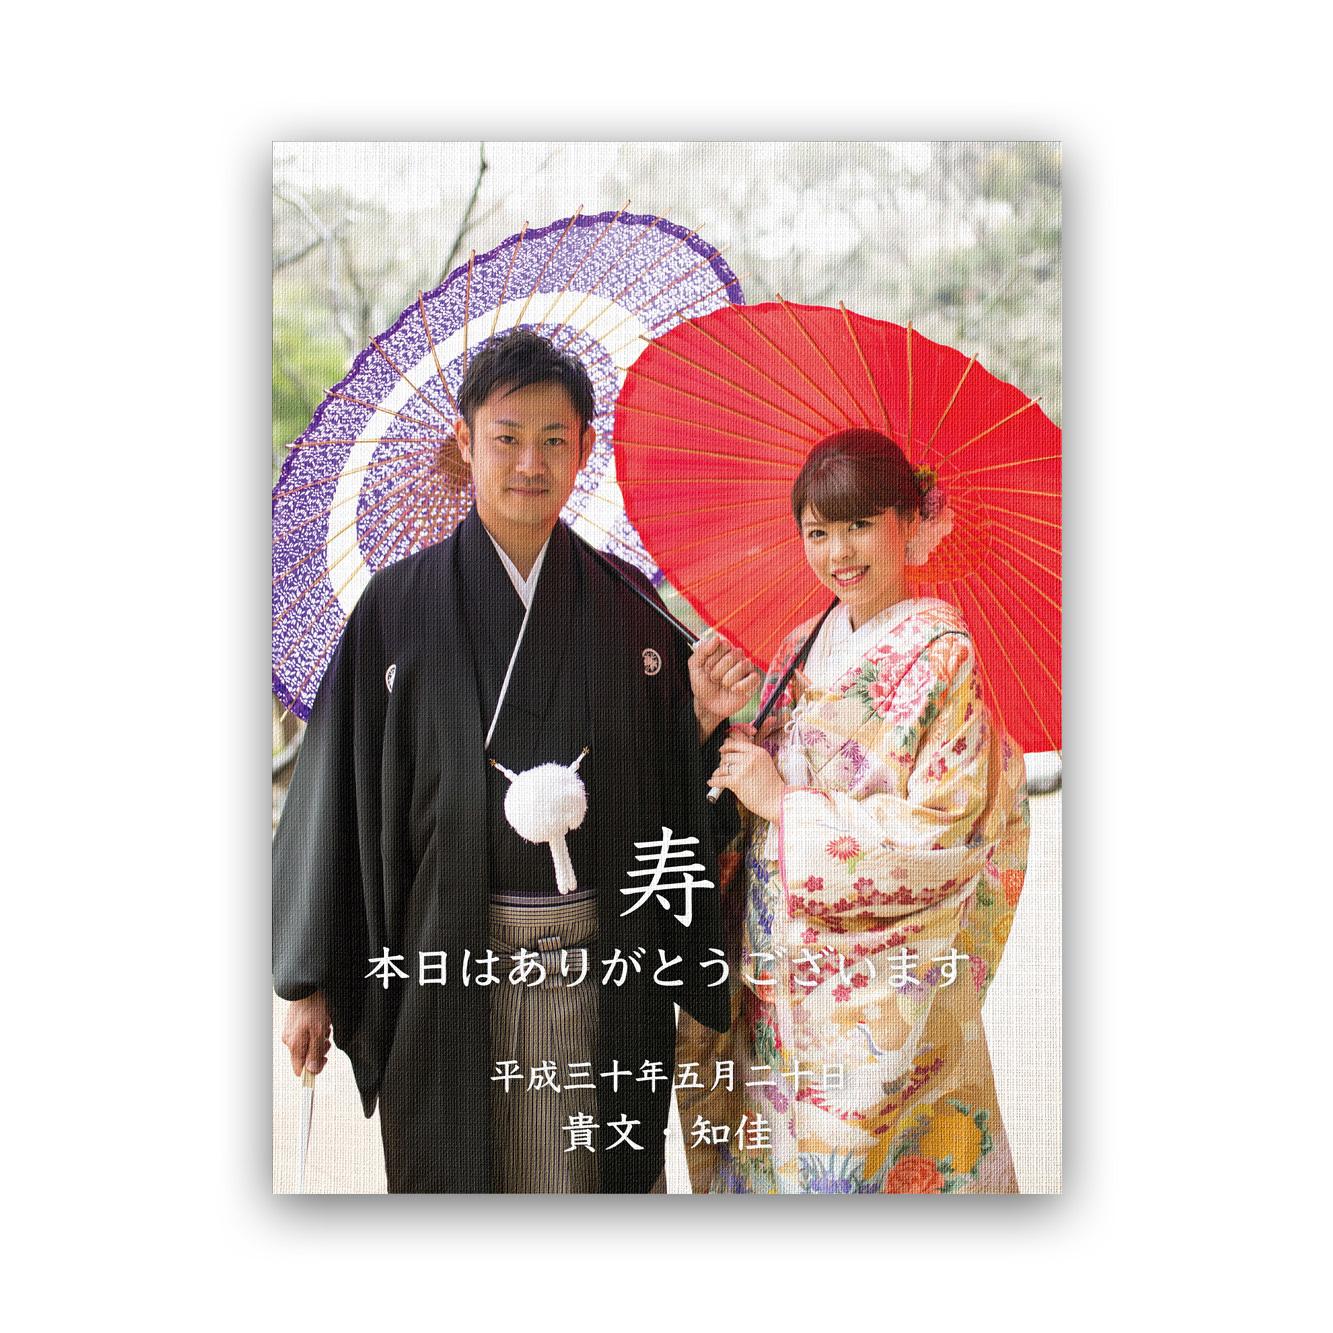 B_design_mirai_shibata_F.jpg